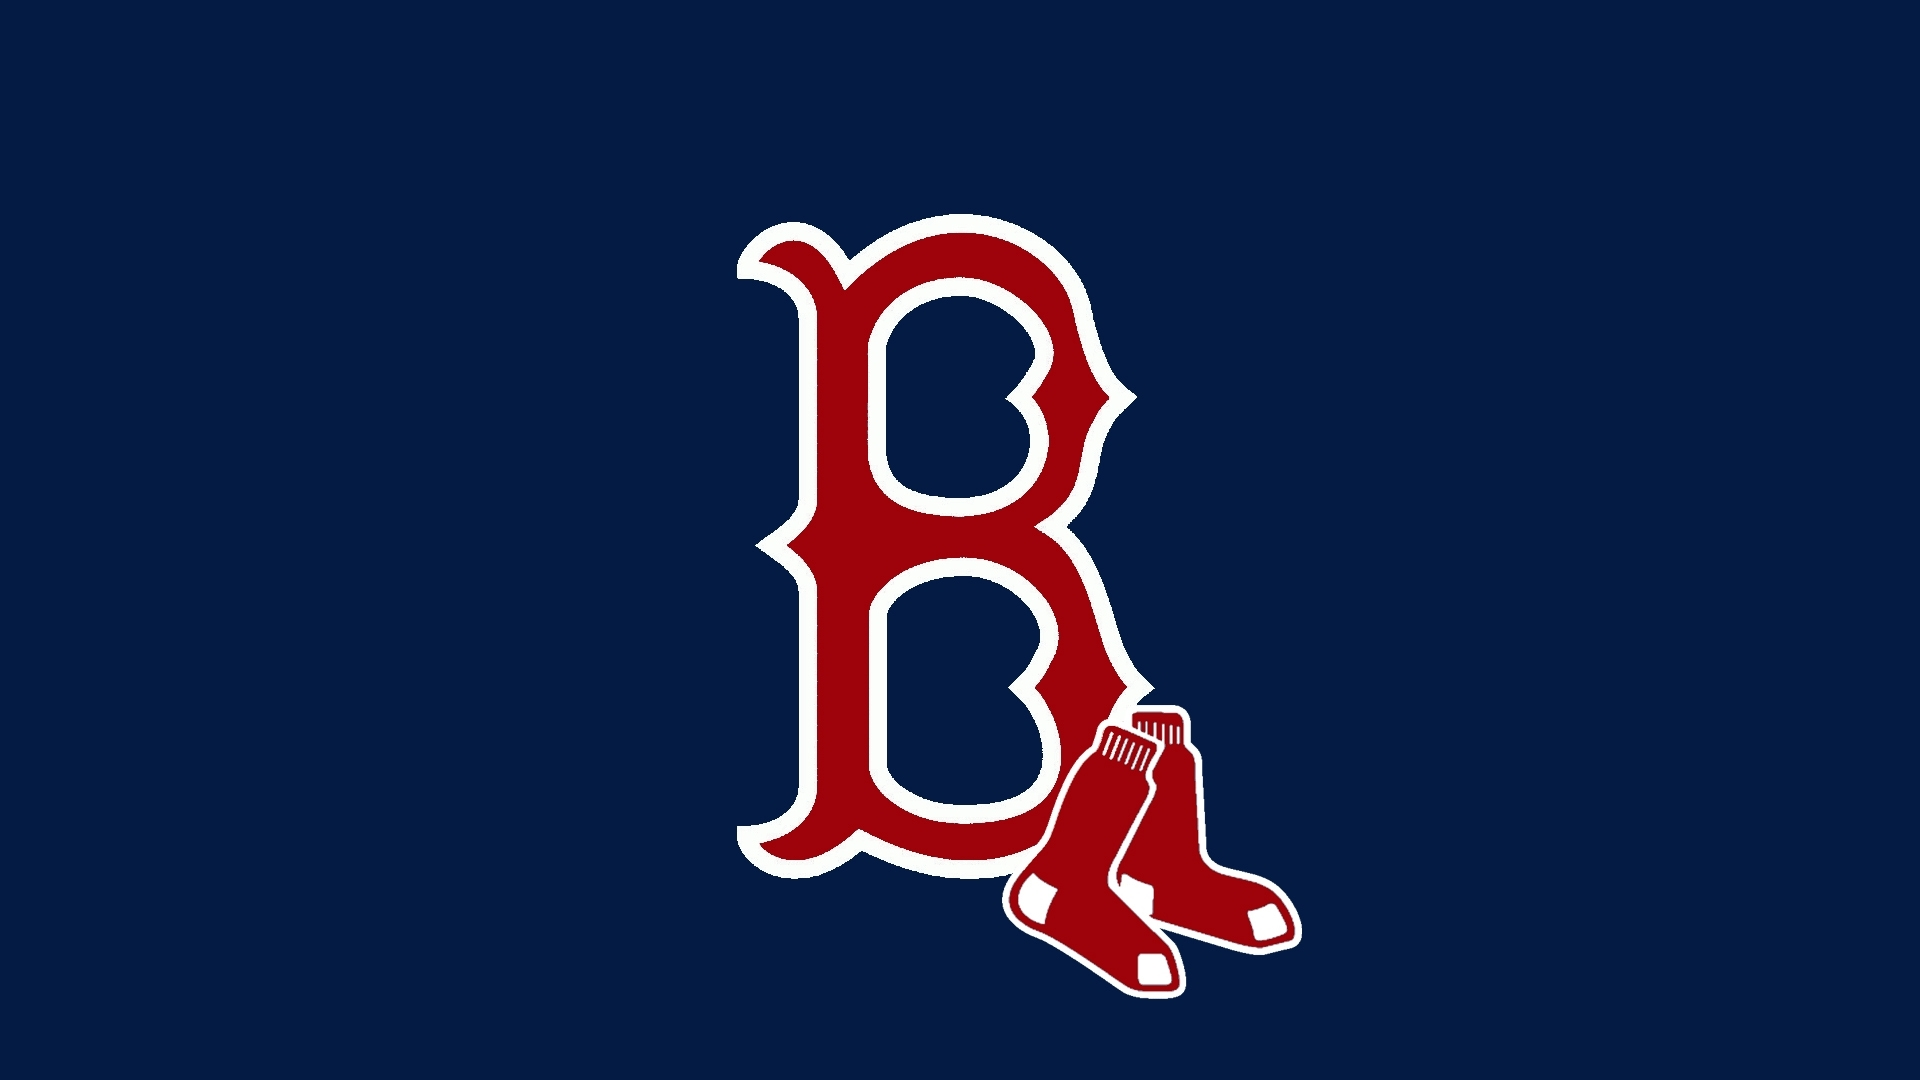 boston red sox wallpaper | wallpaper wide hd